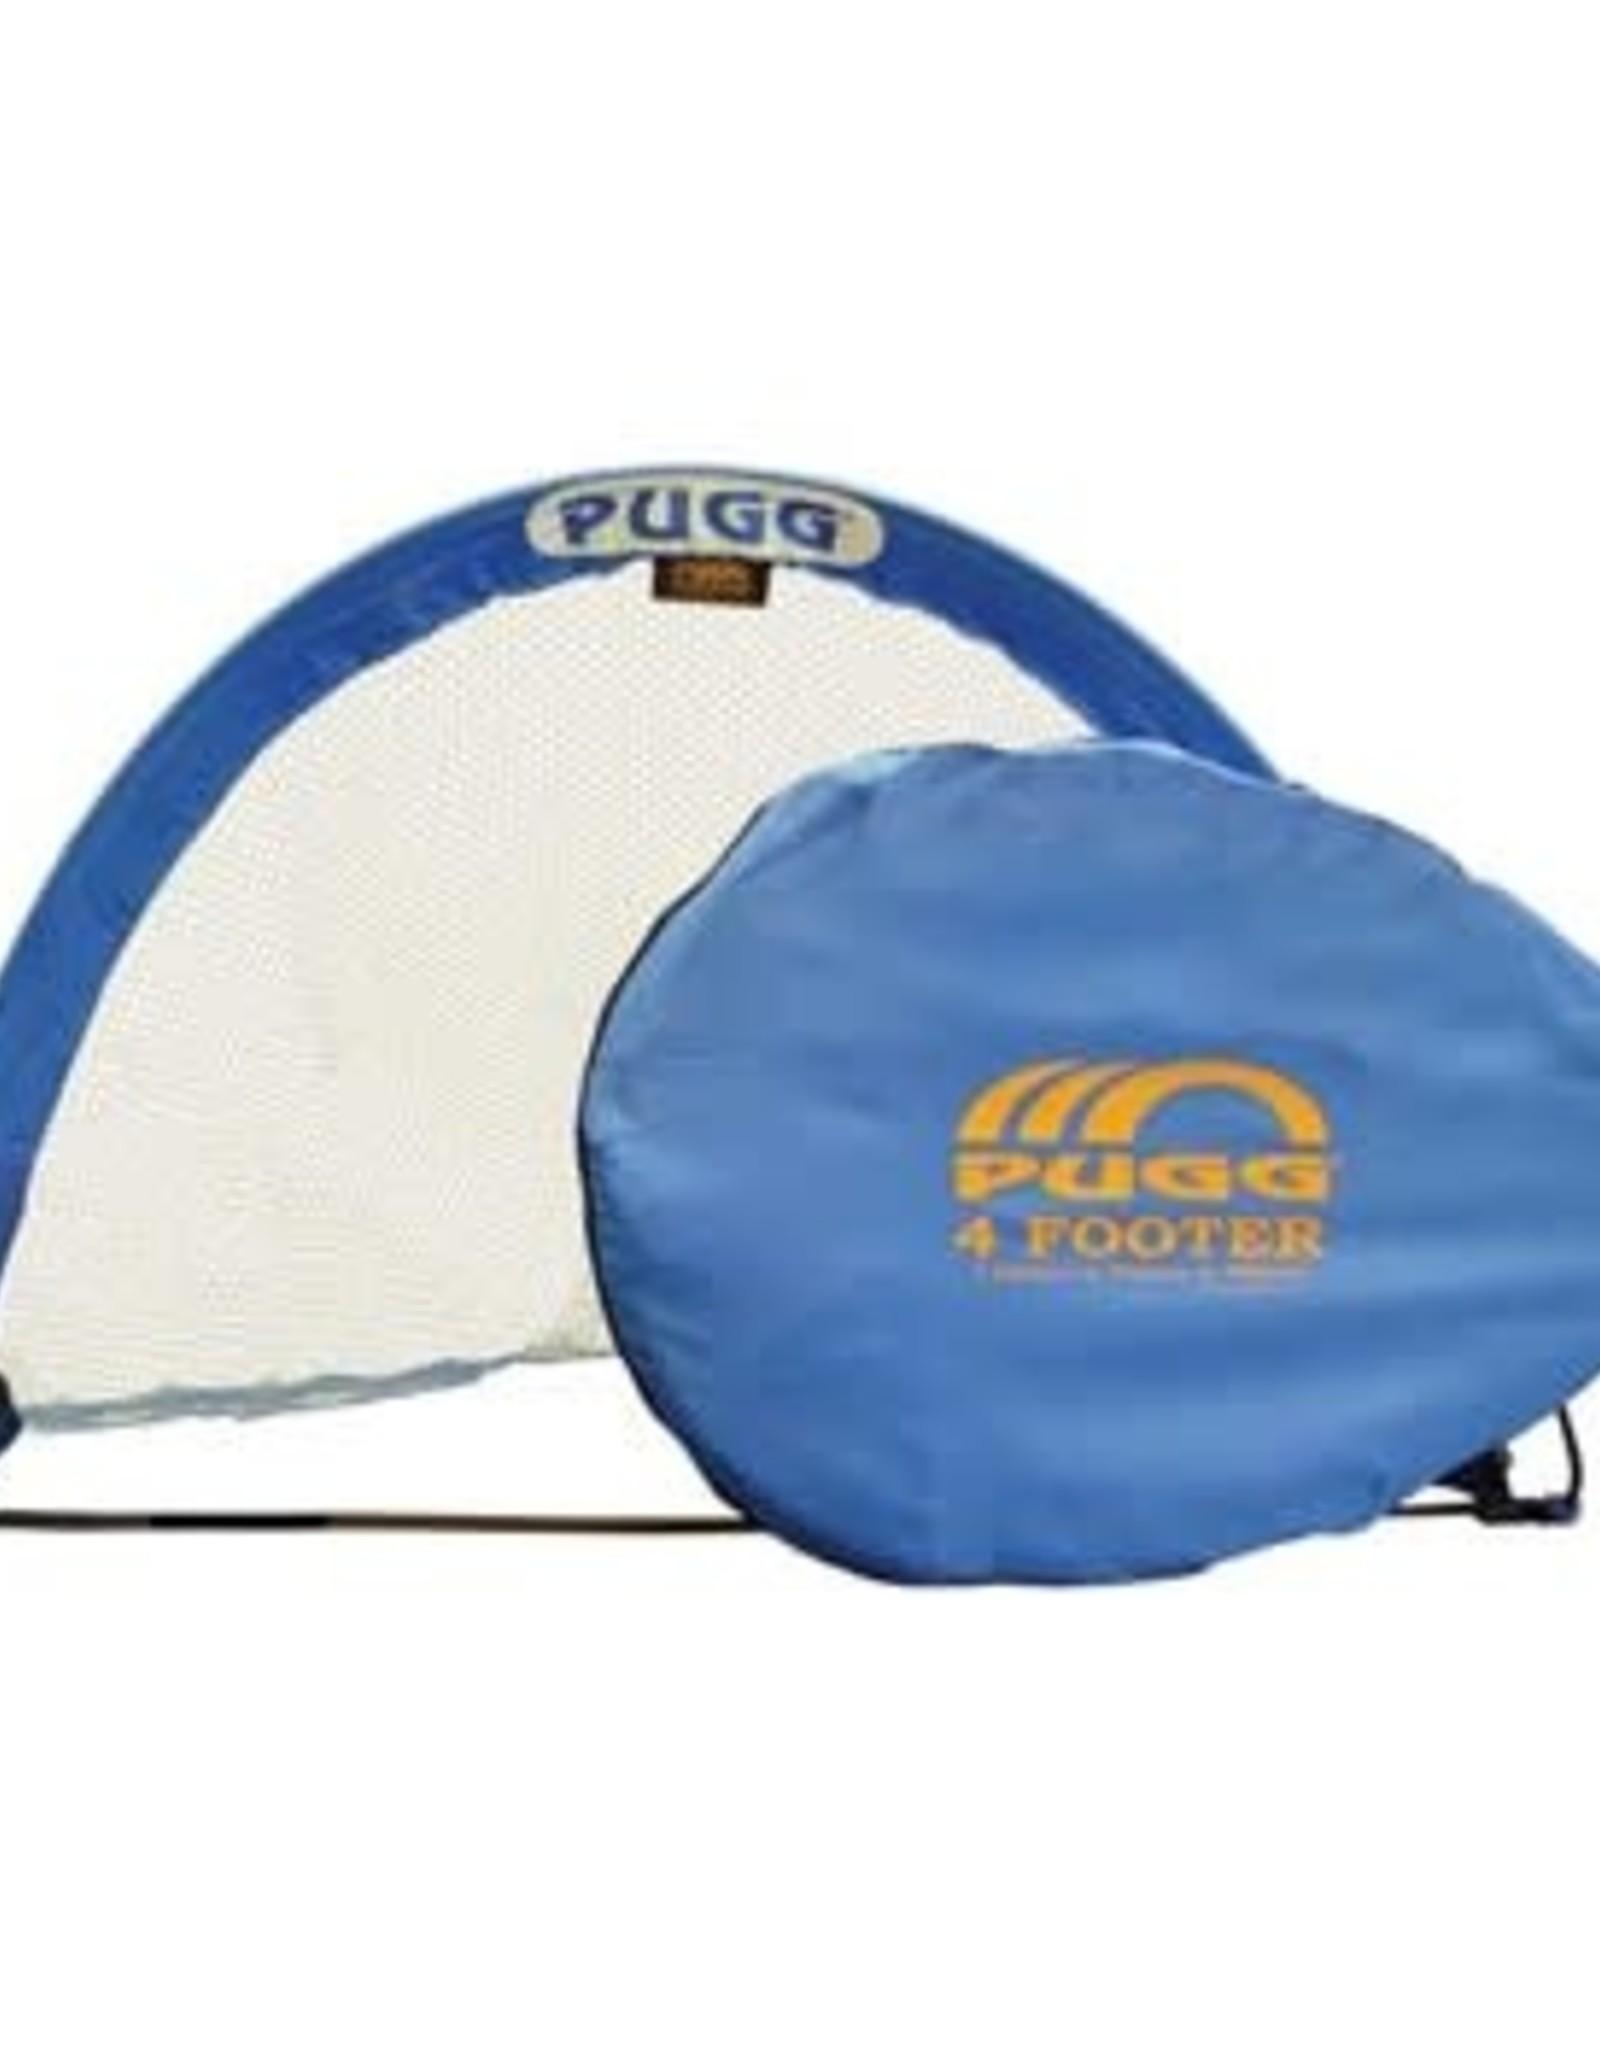 Pugg Pugg 4' Micronet w/ Bag